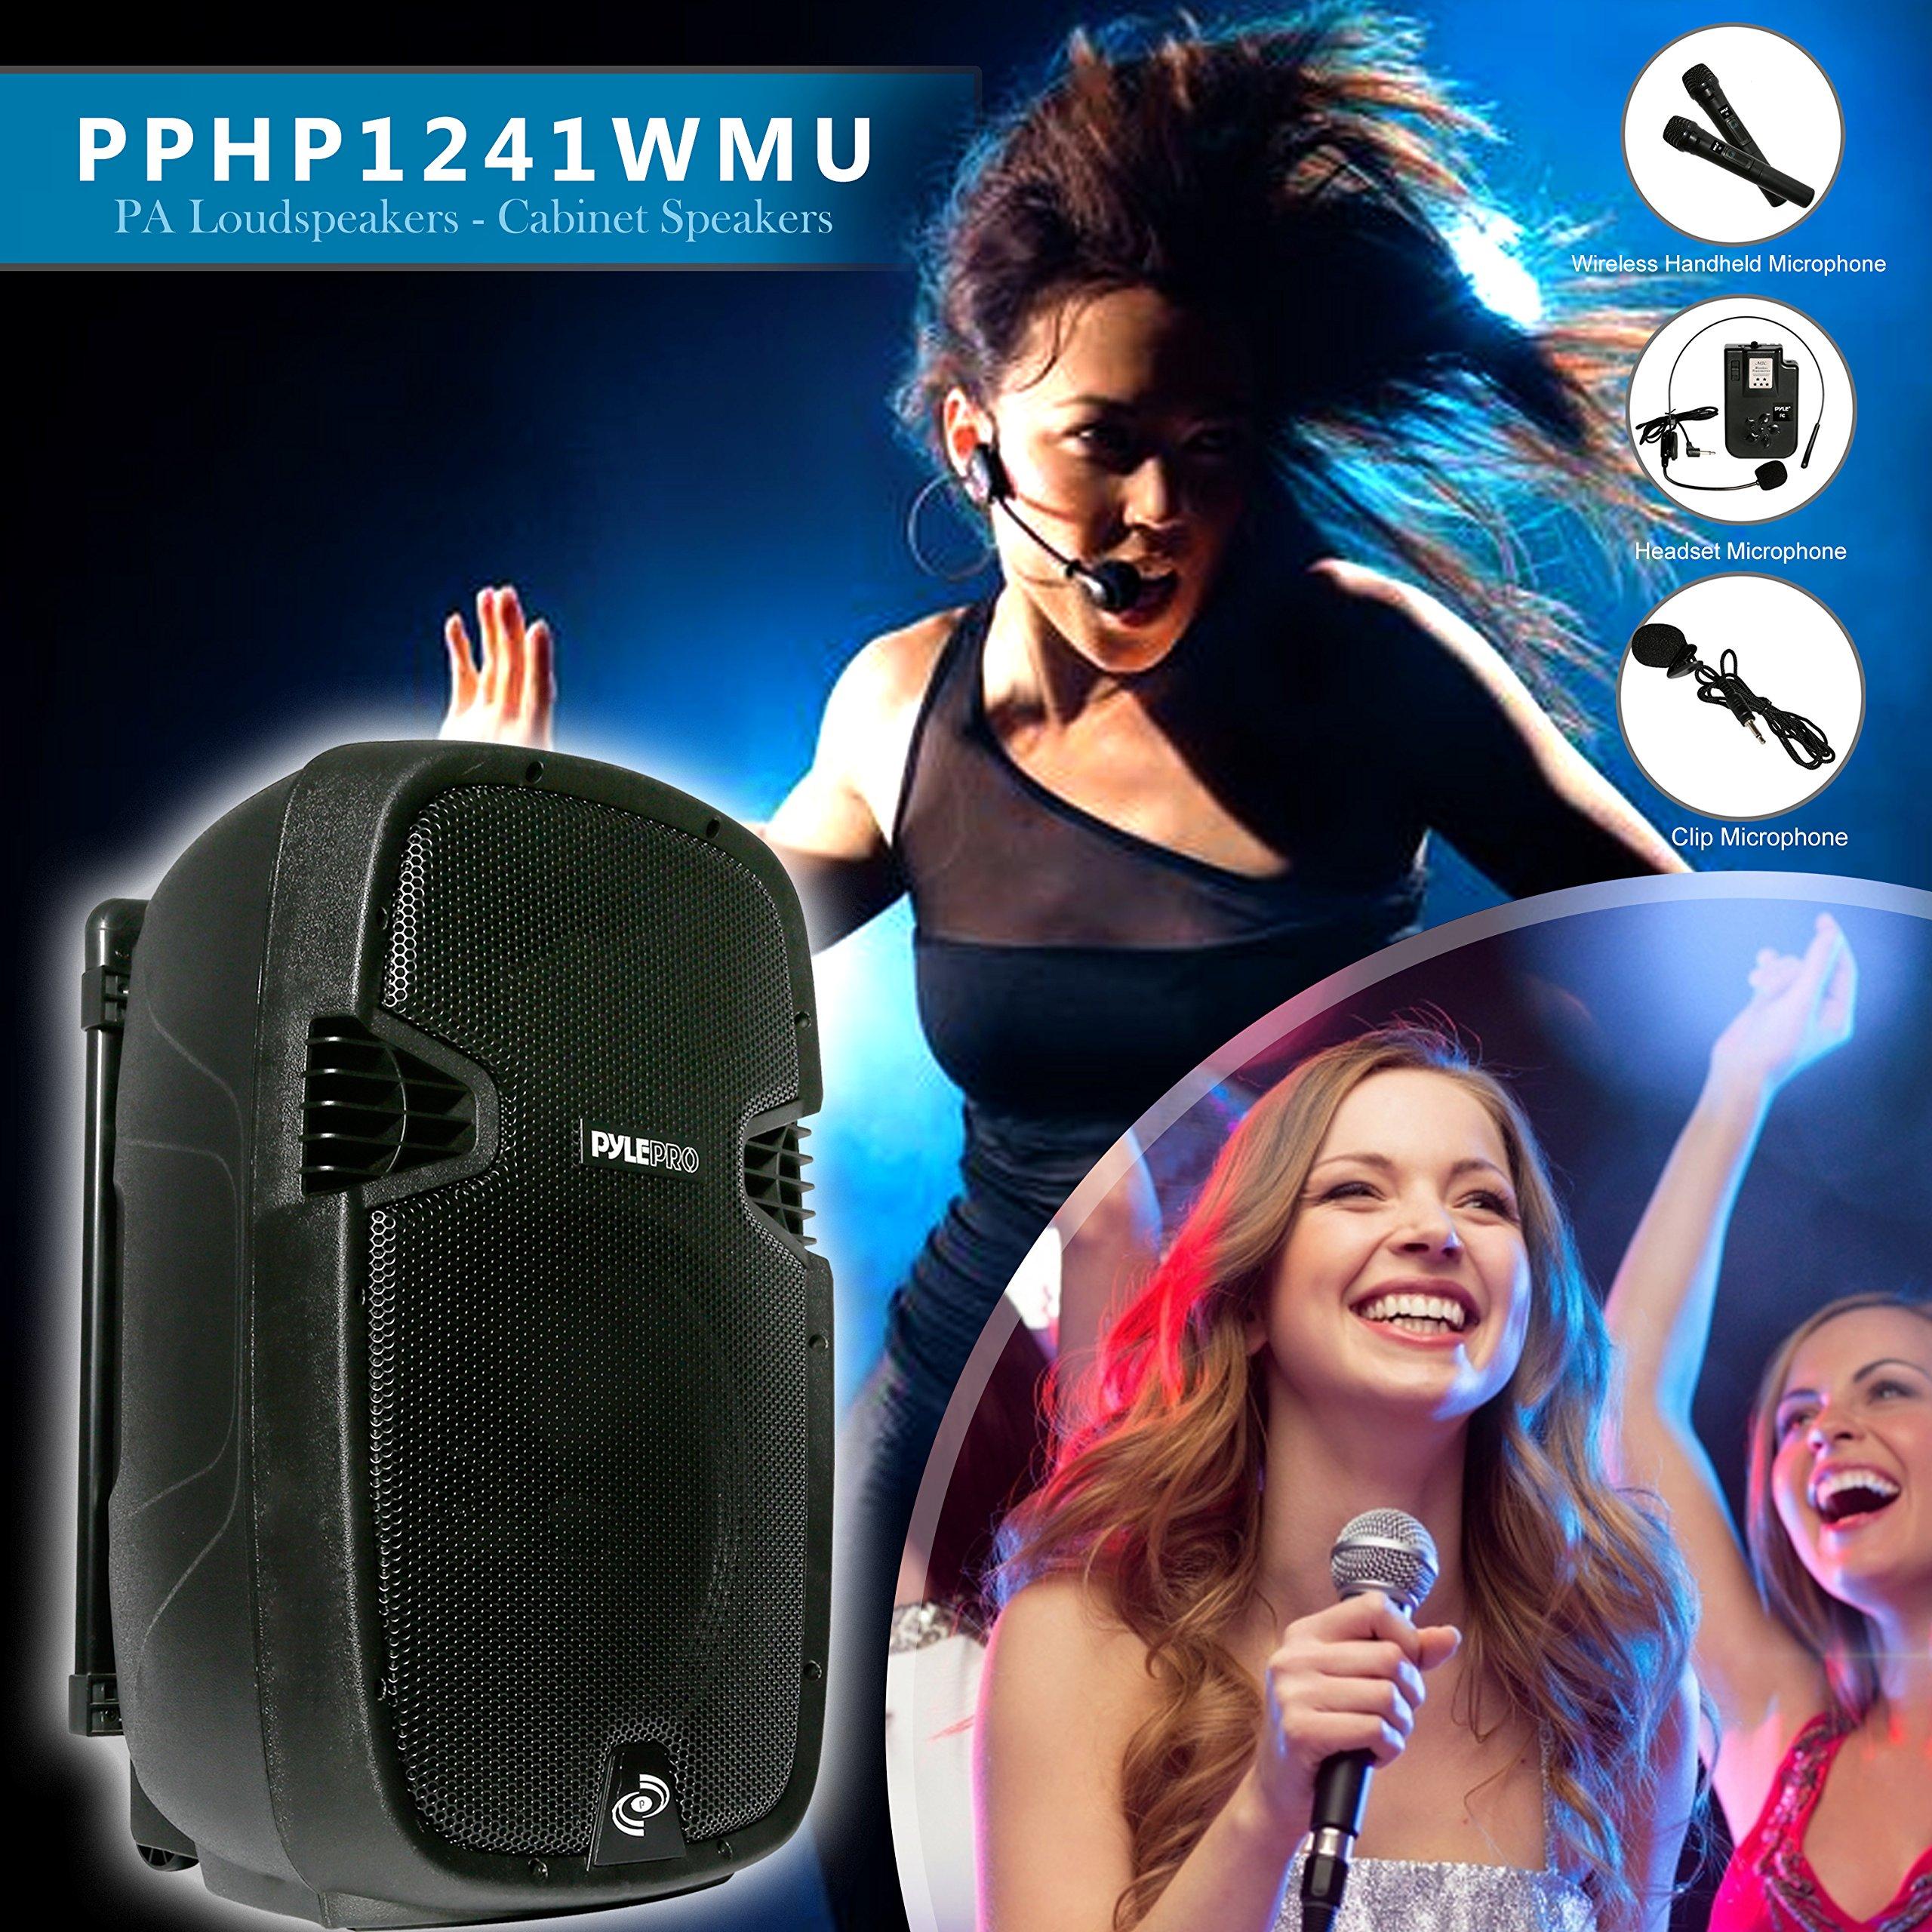 Pyle Bluetooth PA Speaker System Wireless & Portable Powered Karaoke Speaker | Built-in Rechargeable Battery | Handheld Microphone, Headset, Belt-pack | 12'' Subwoofer | 1000 Watt (PPHP1241WMU)